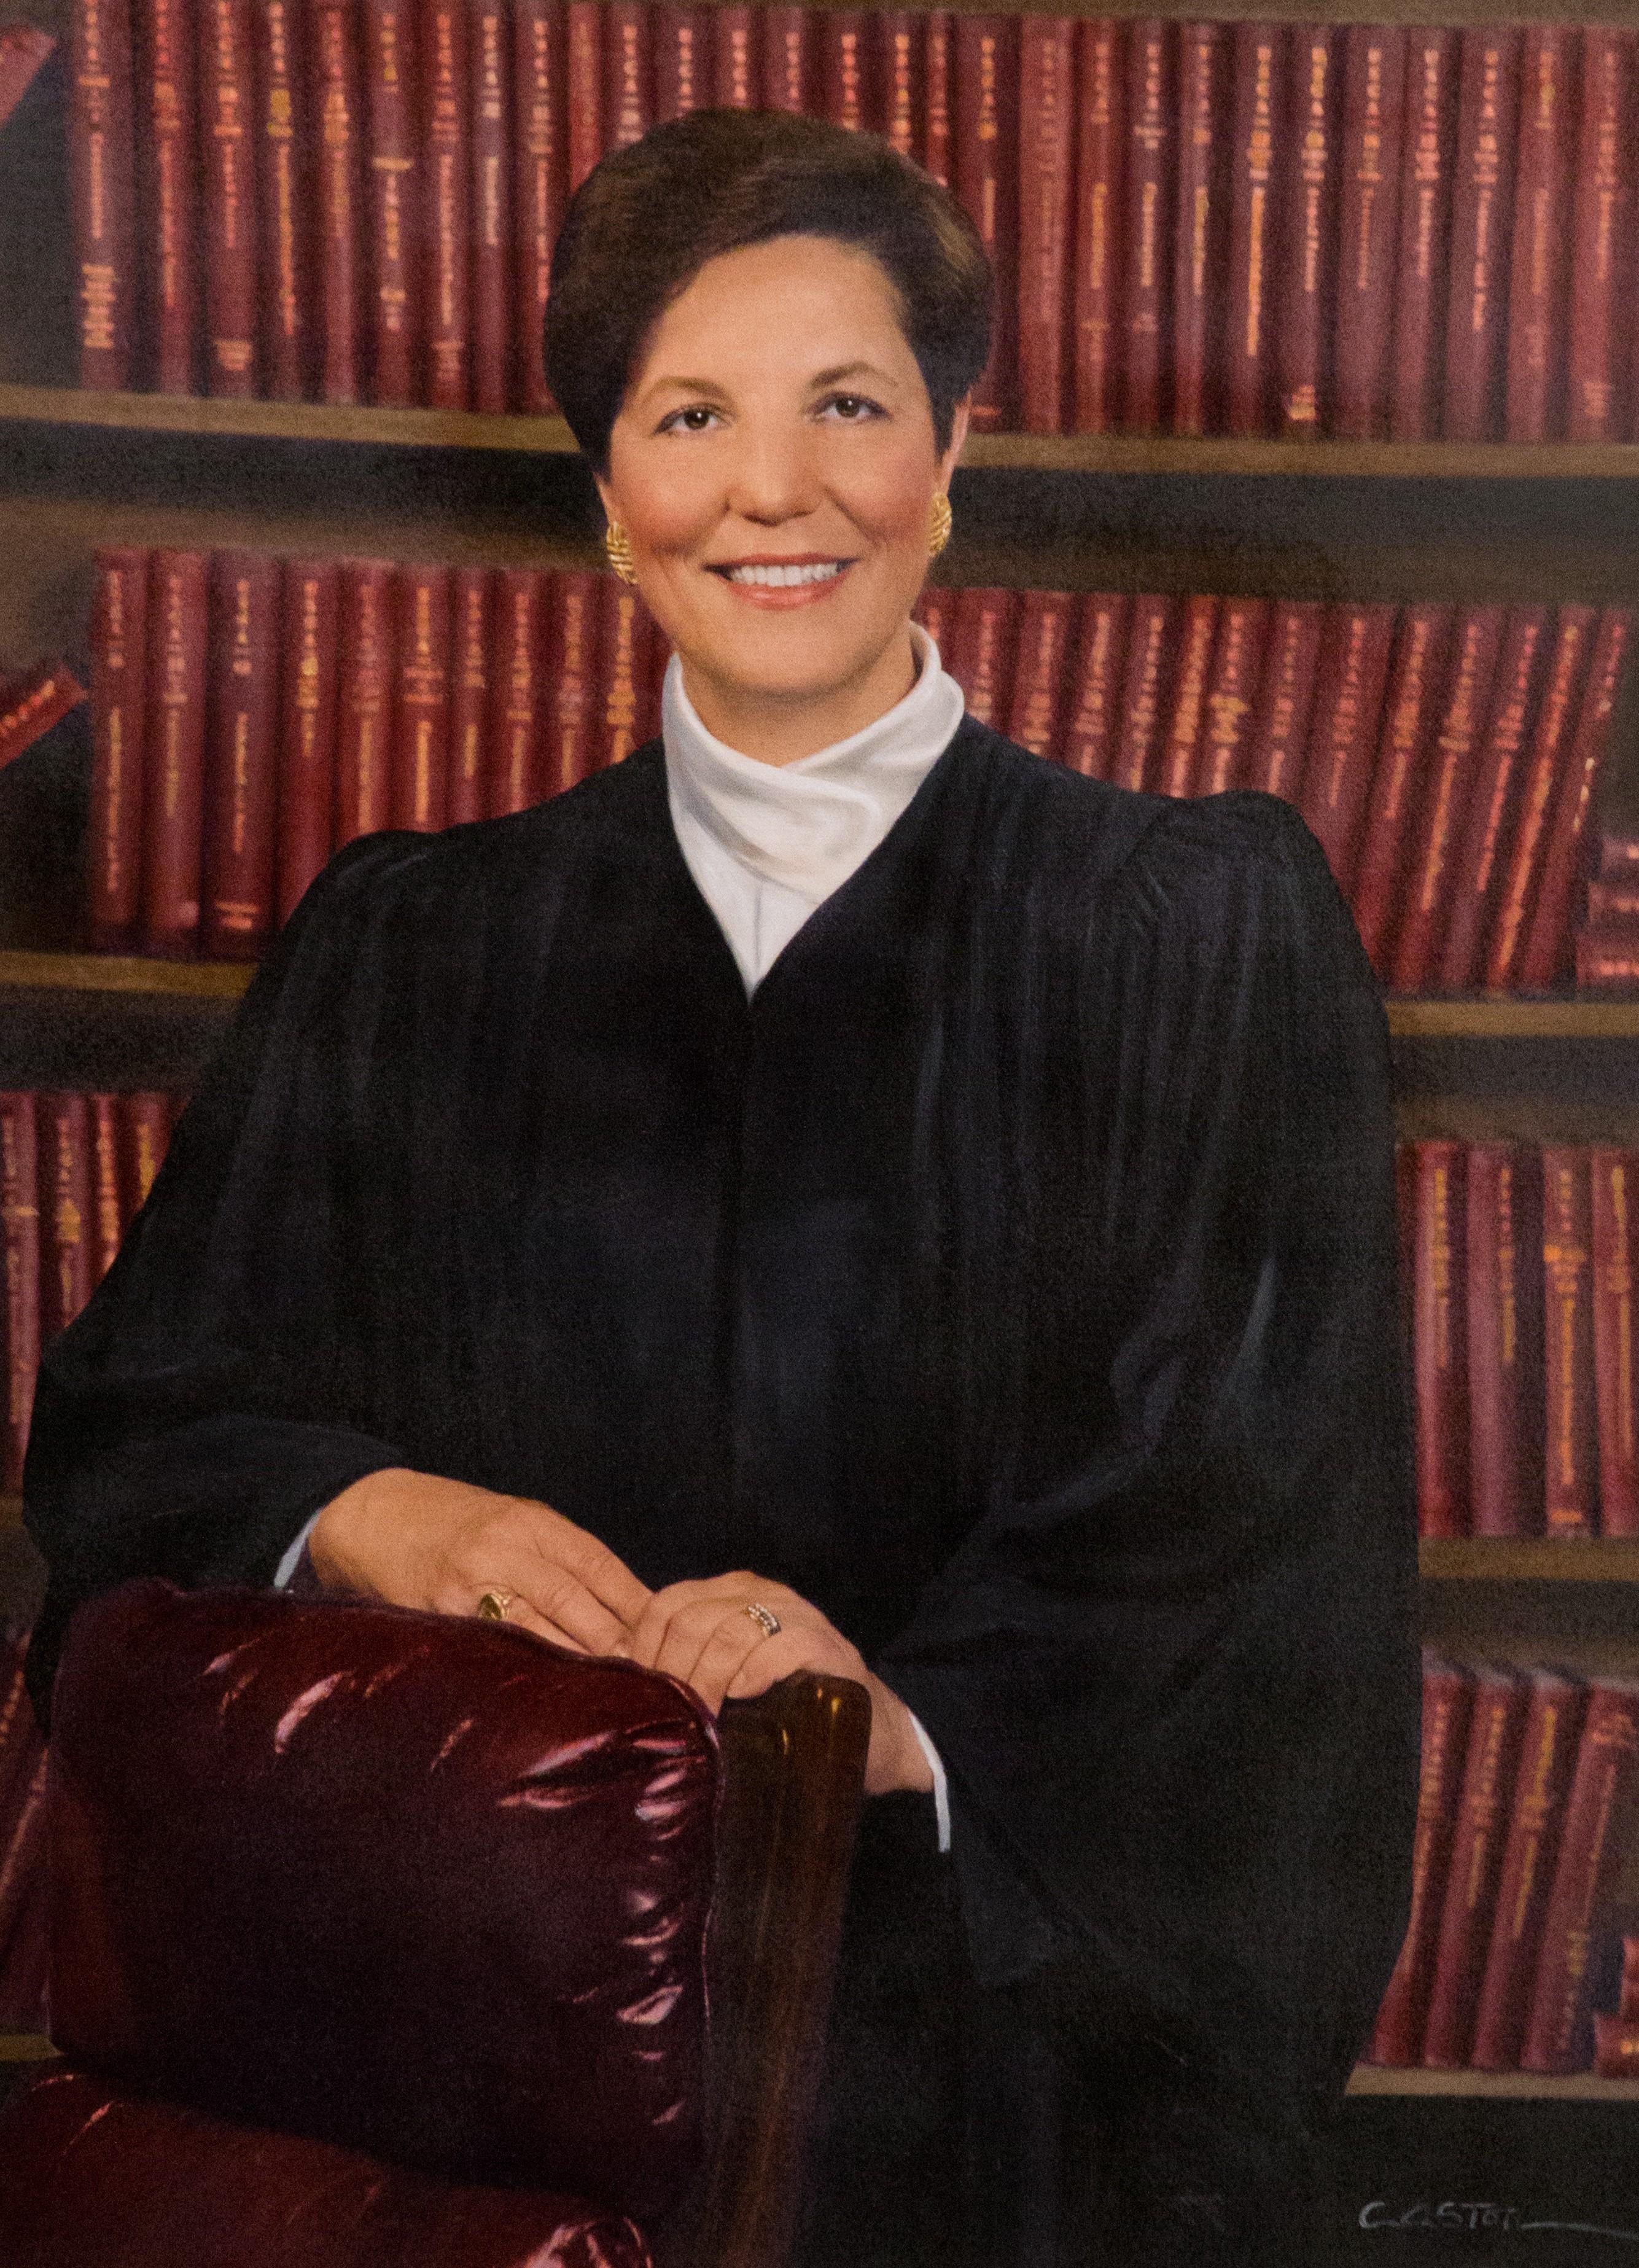 Judge Rosemarie Annunziata